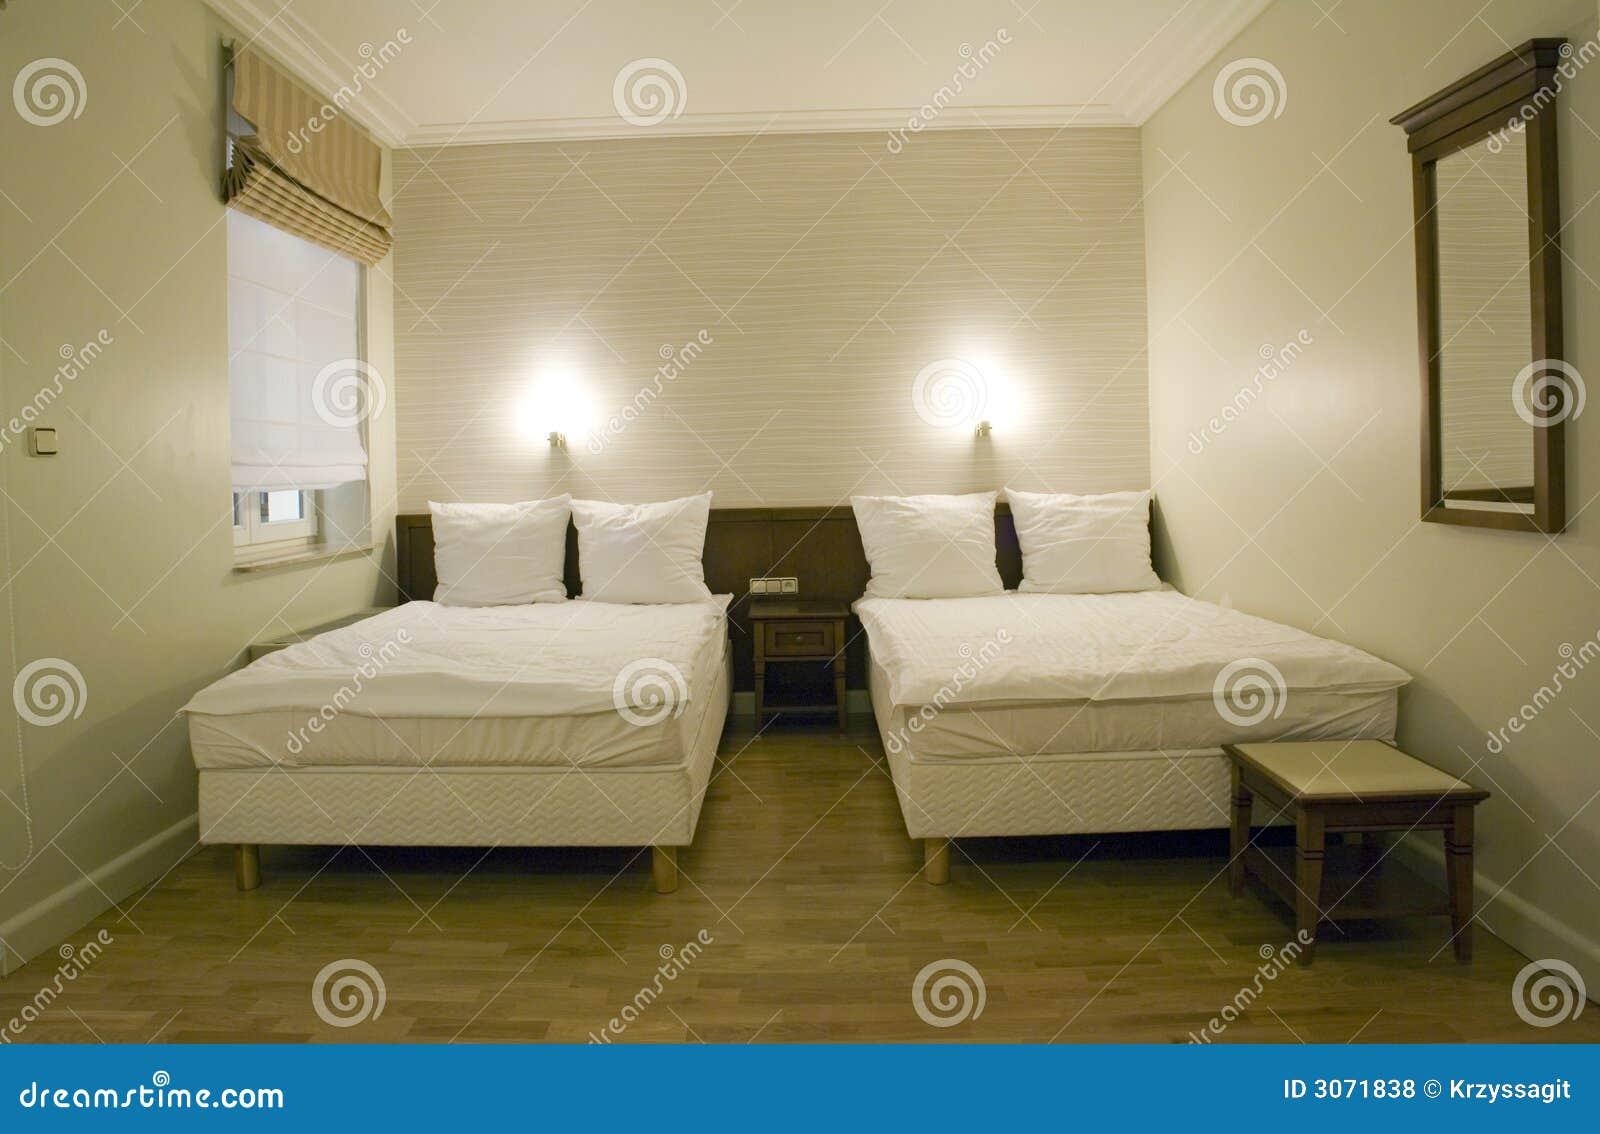 Kleine slaapkamer stock foto afbeelding bestaande uit ruimte 3071838 - Slaapkamer klein gebied ...